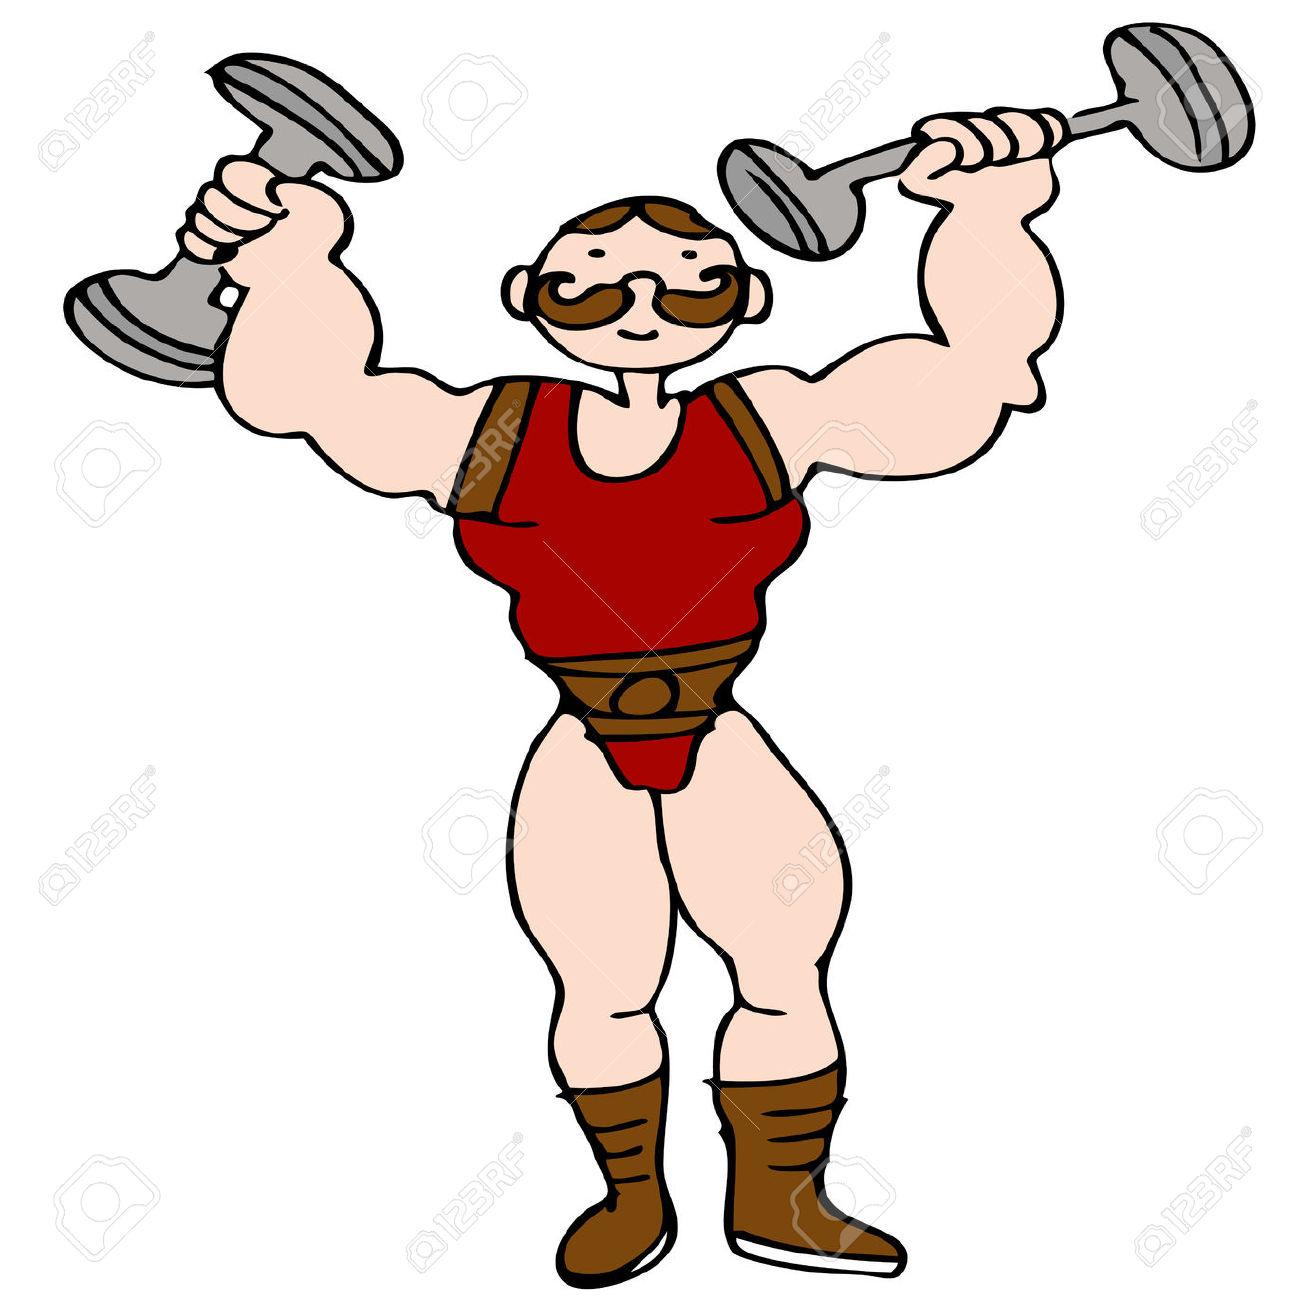 Circus Strong Man Clipart-Circus Strong Man Clipart-3